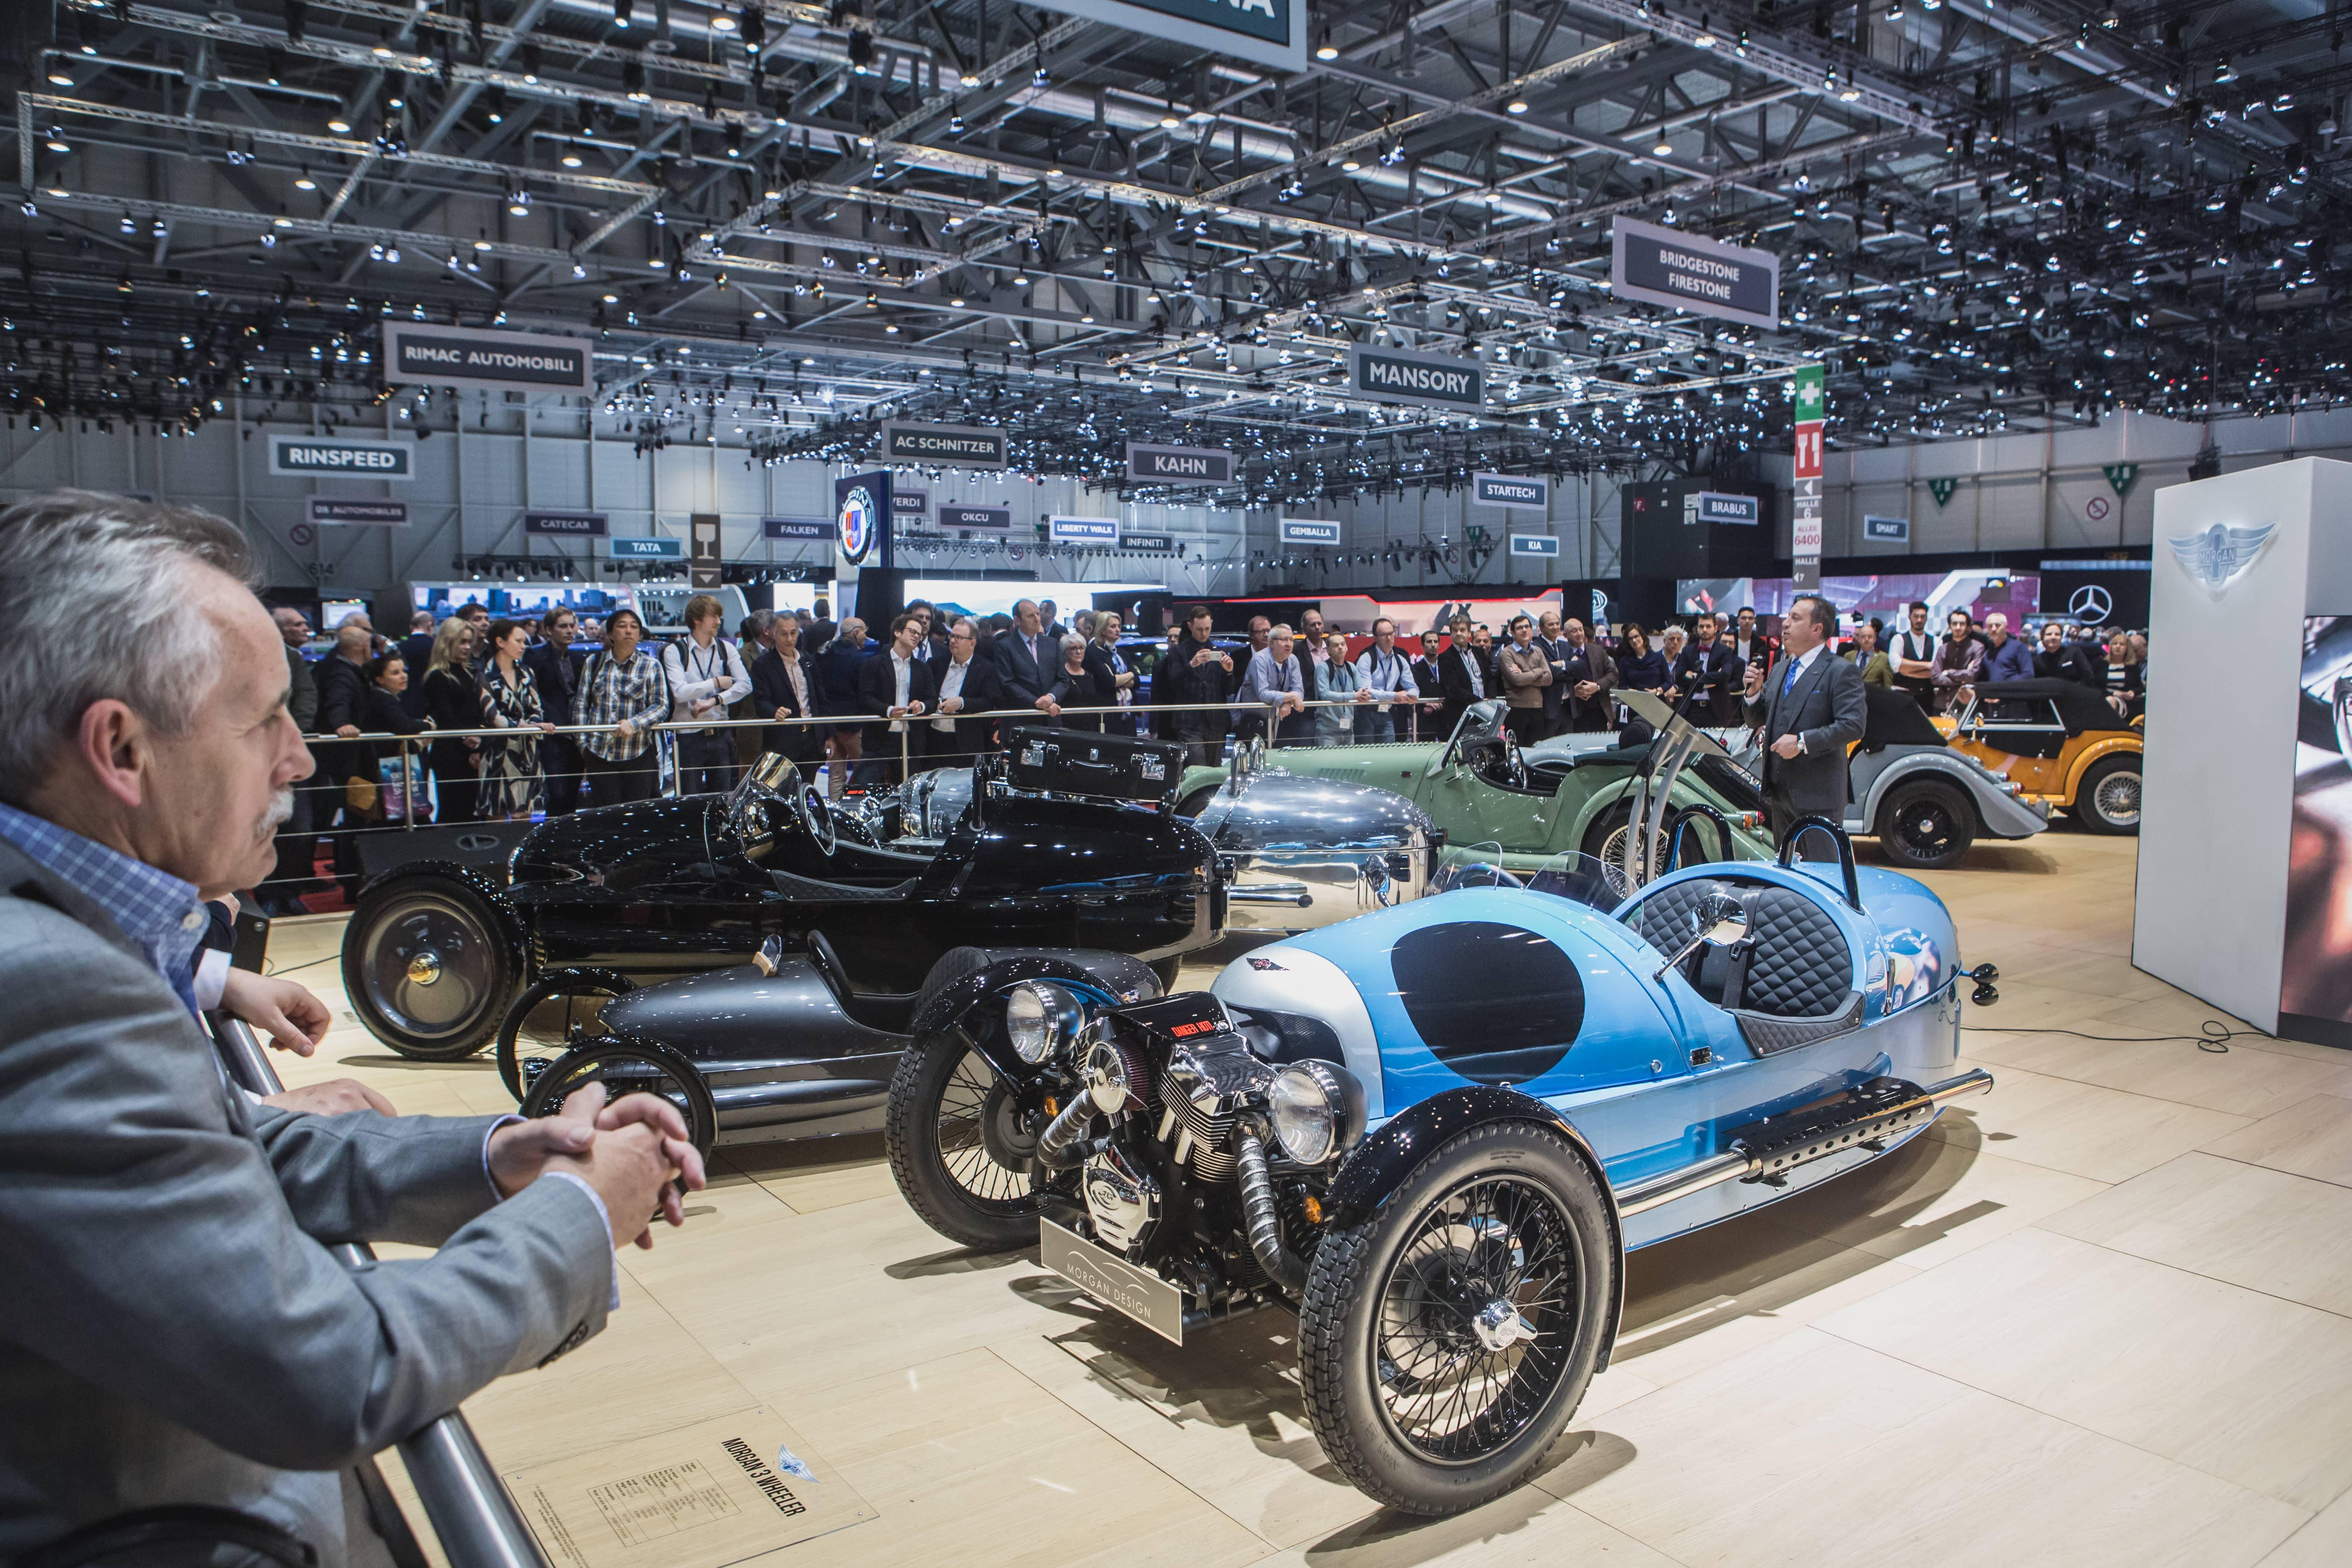 88th geneva international motor show - Geneva car show ...